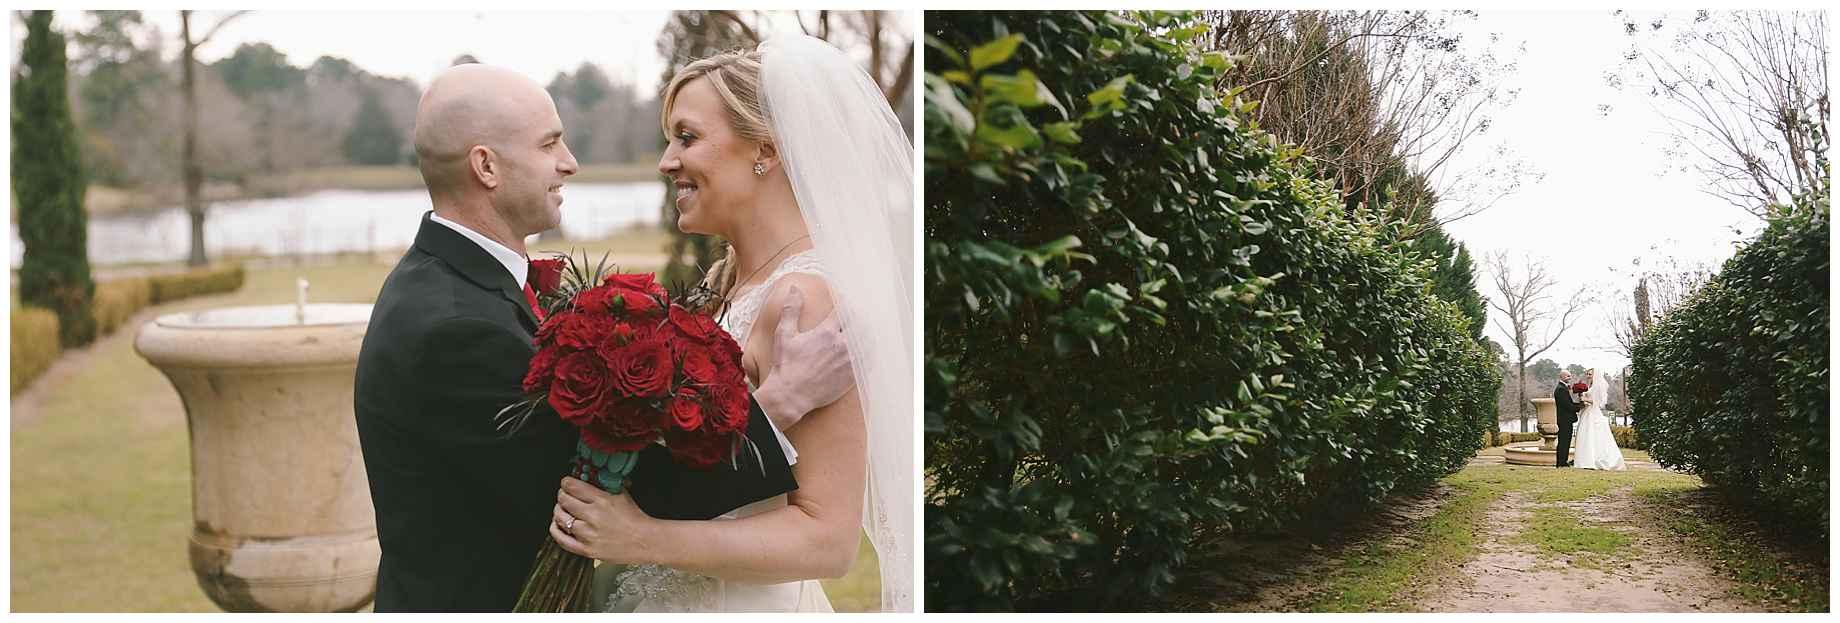 elmwood-gardens-wedding-photos-07